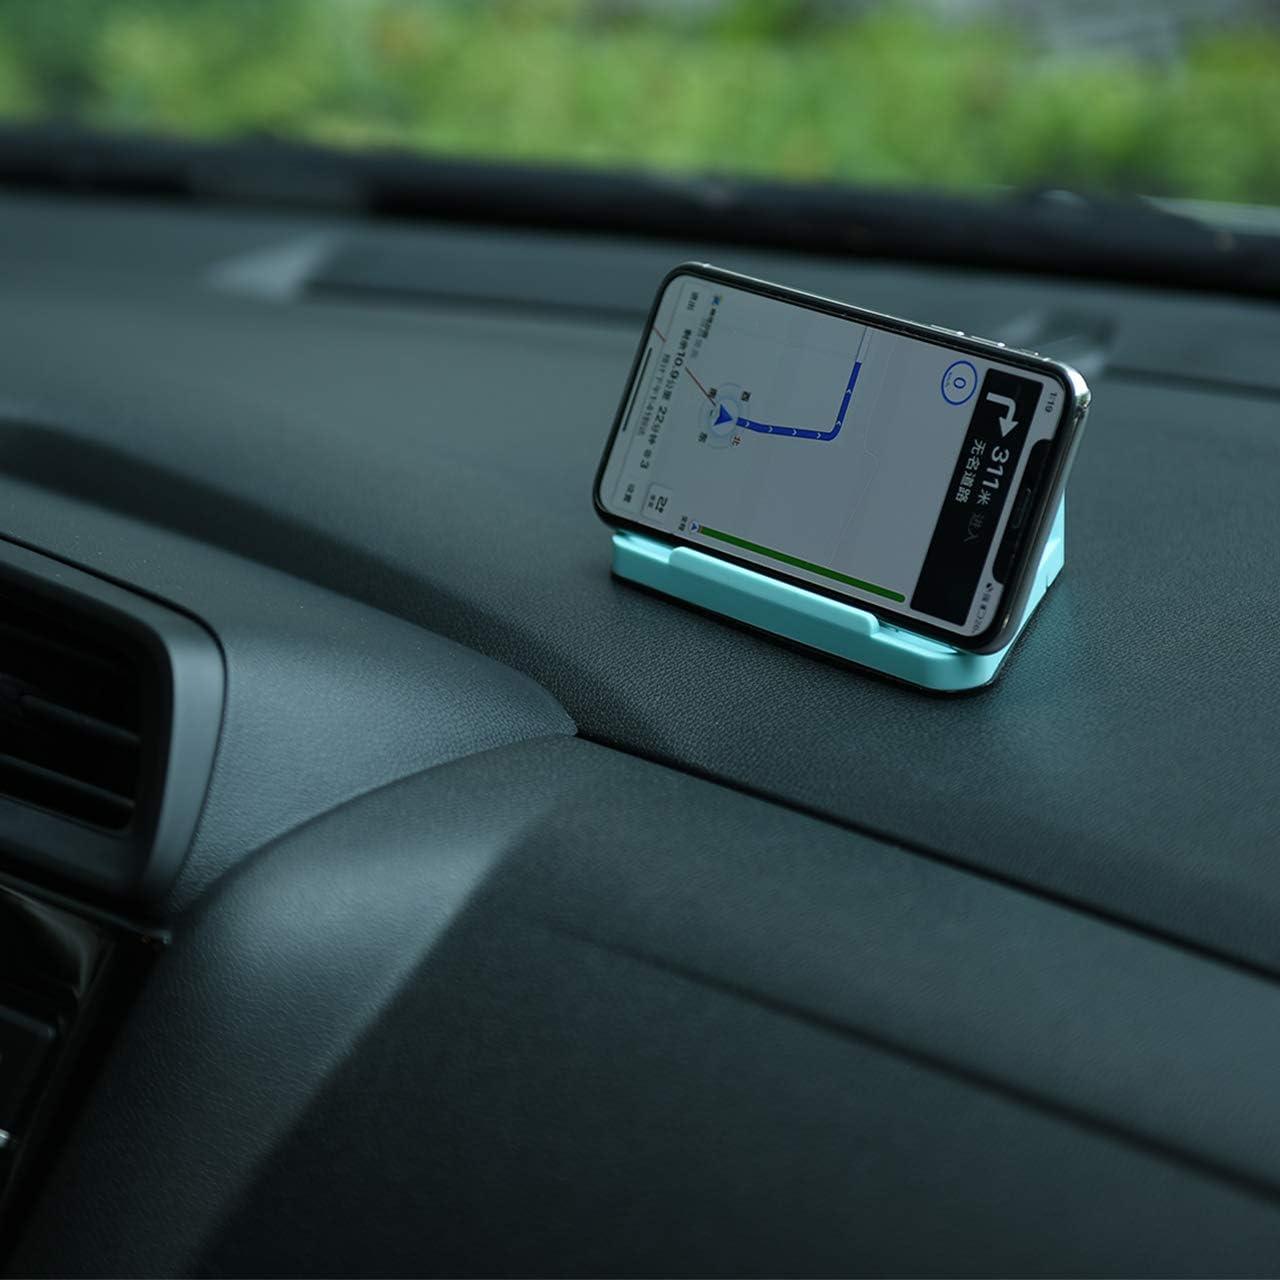 Dark Grey TXEsign Car Dashboard Desk Prop Stand Holder for Sunglass Phone with Non Slip Grip Pad